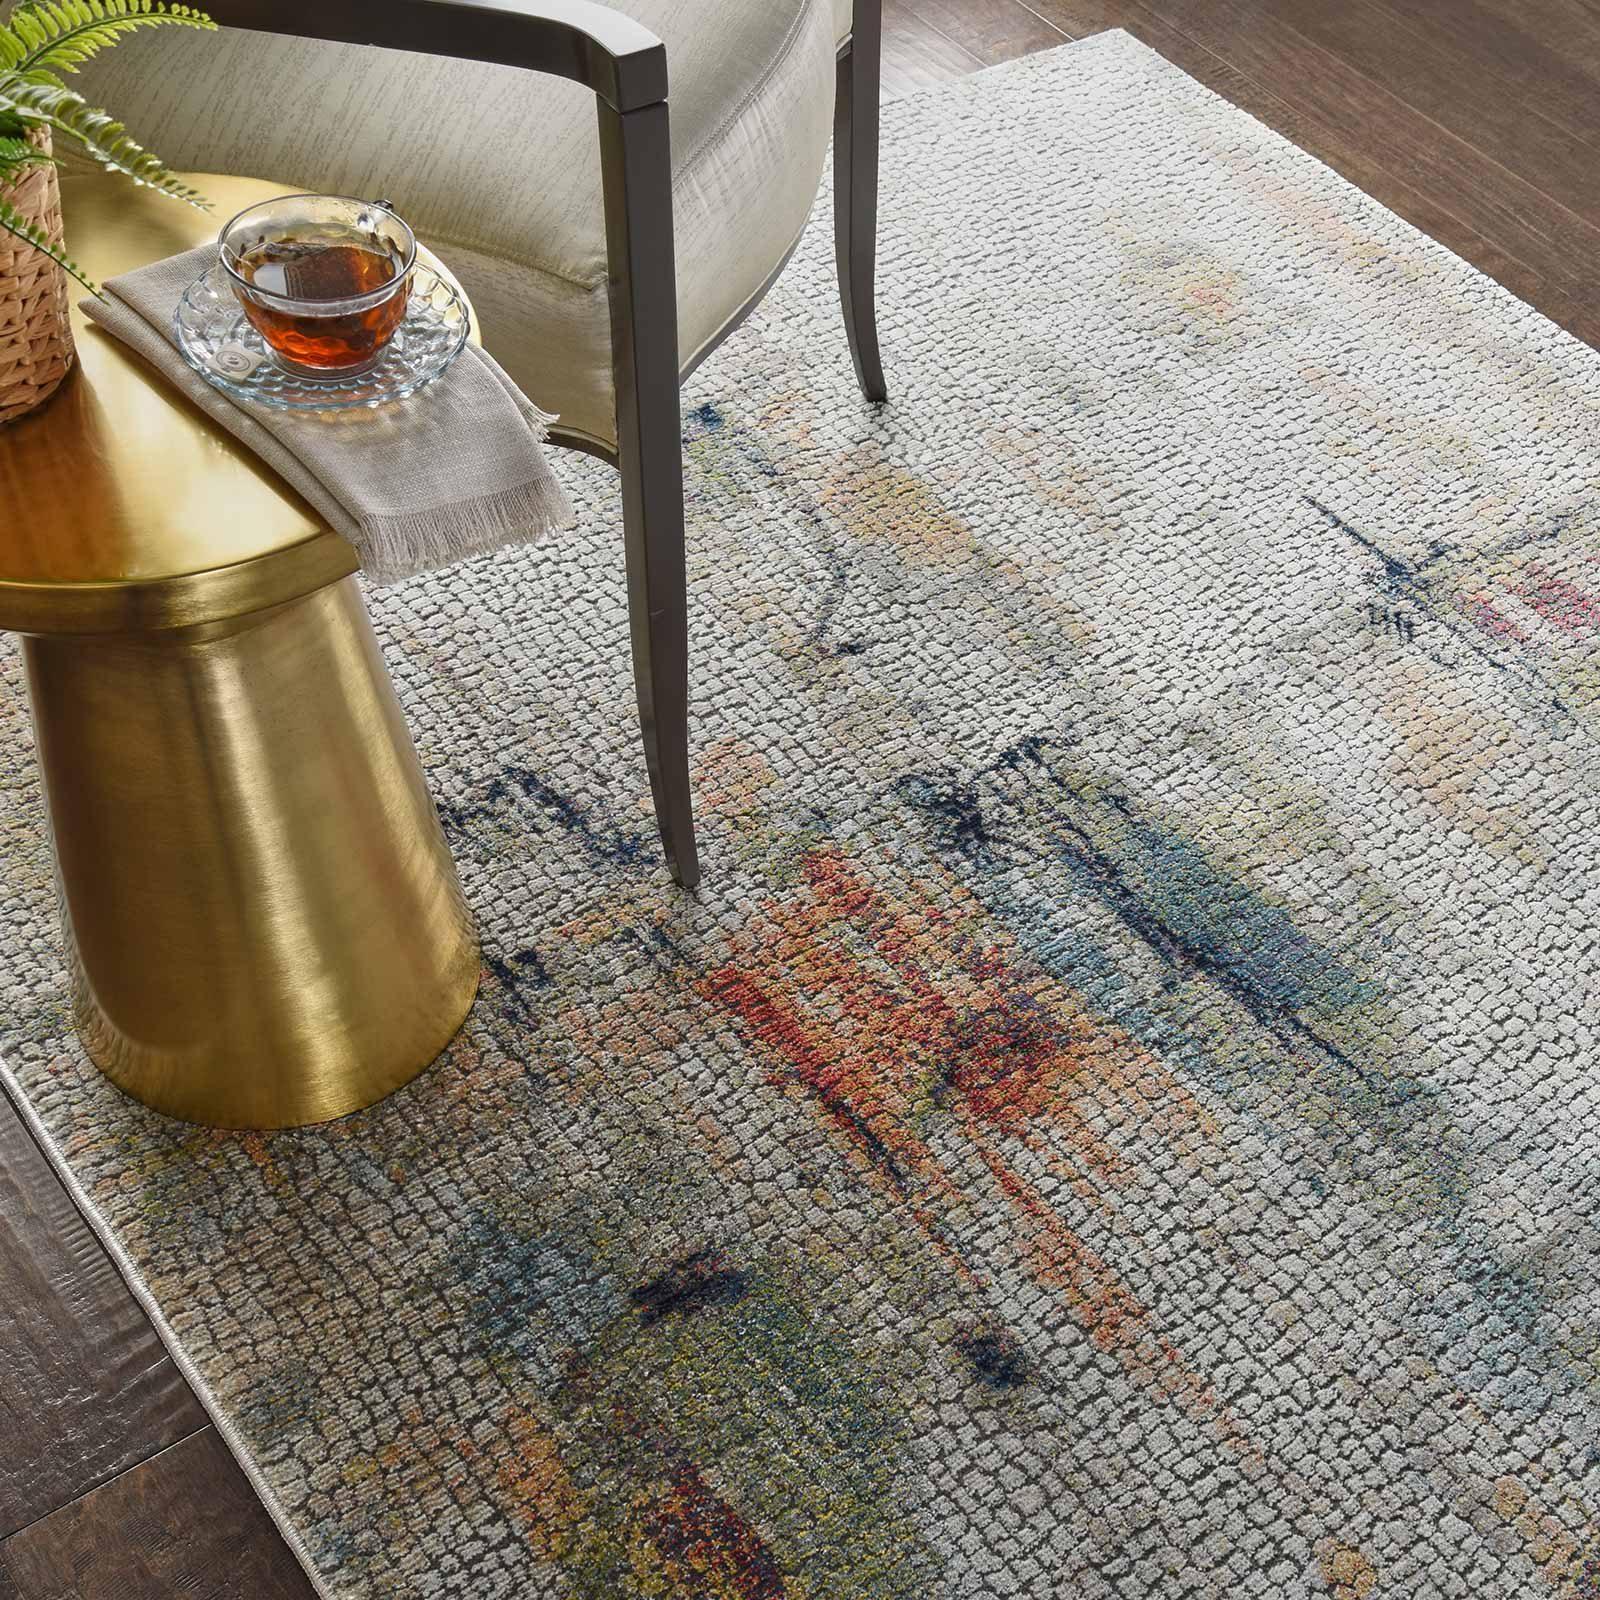 Andessi tapijt Ankara Global ANR09 IVORYMULTI 5X8 099446474896 interior 2 C